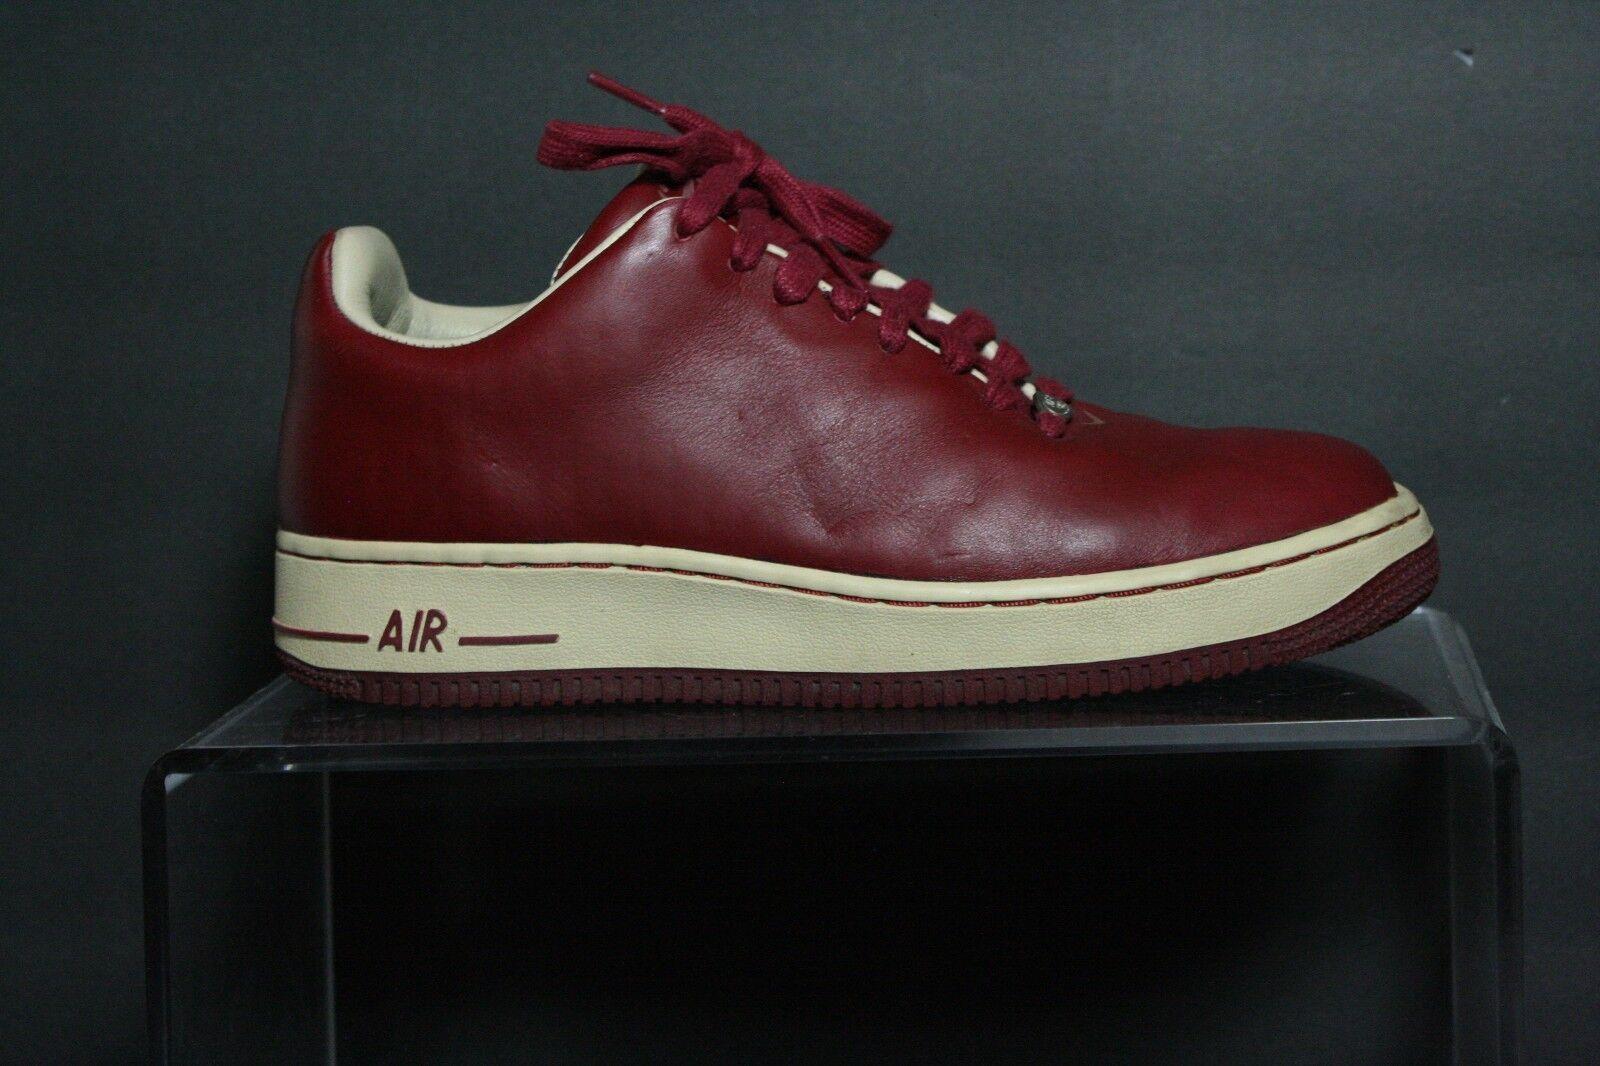 Nike Air Force 1 Low LTD 05' Seamless Sneakers Athletic Hipster Multi Men's 7.5